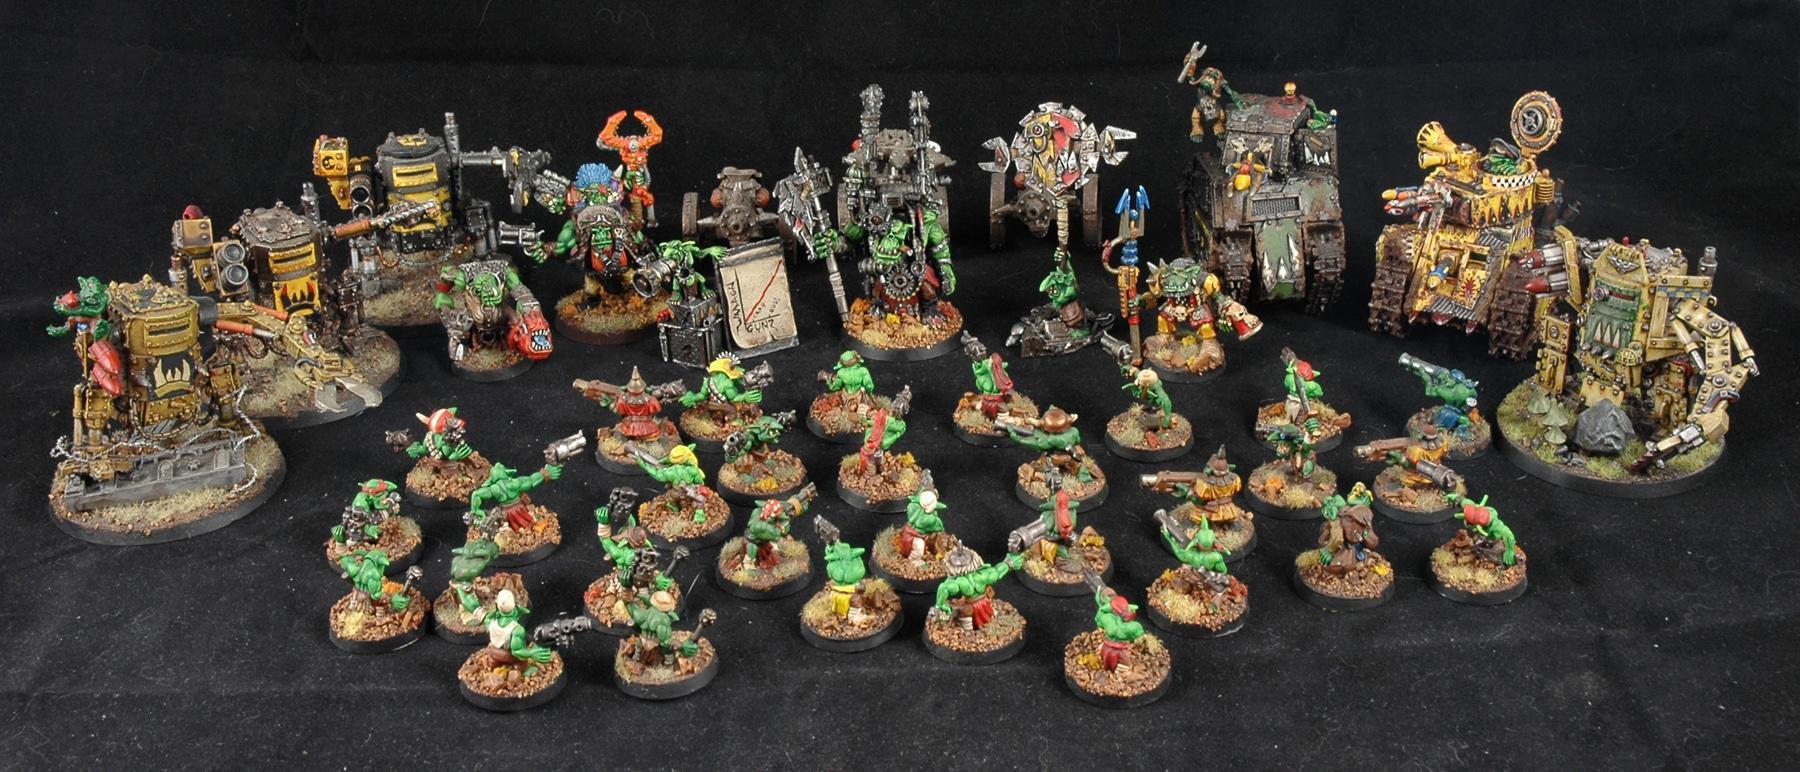 Army, Bad Moons, Gretchin, Grots, Orks, Warhammer 40,000